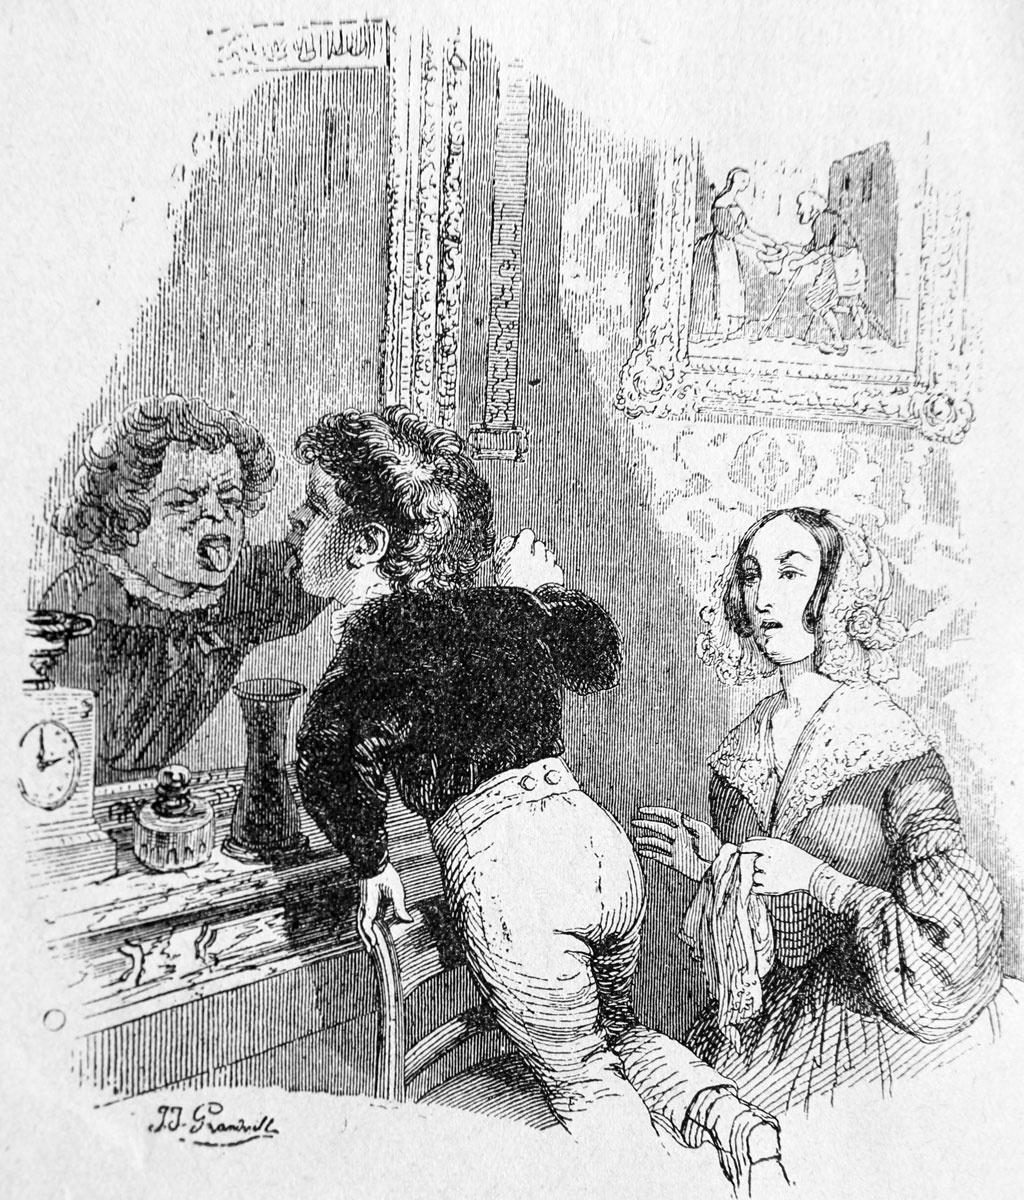 Жан Иньяс Изидор (Жерар) Гранвиль. Малыш и зеркало. Иллюстрации к басням Флориана